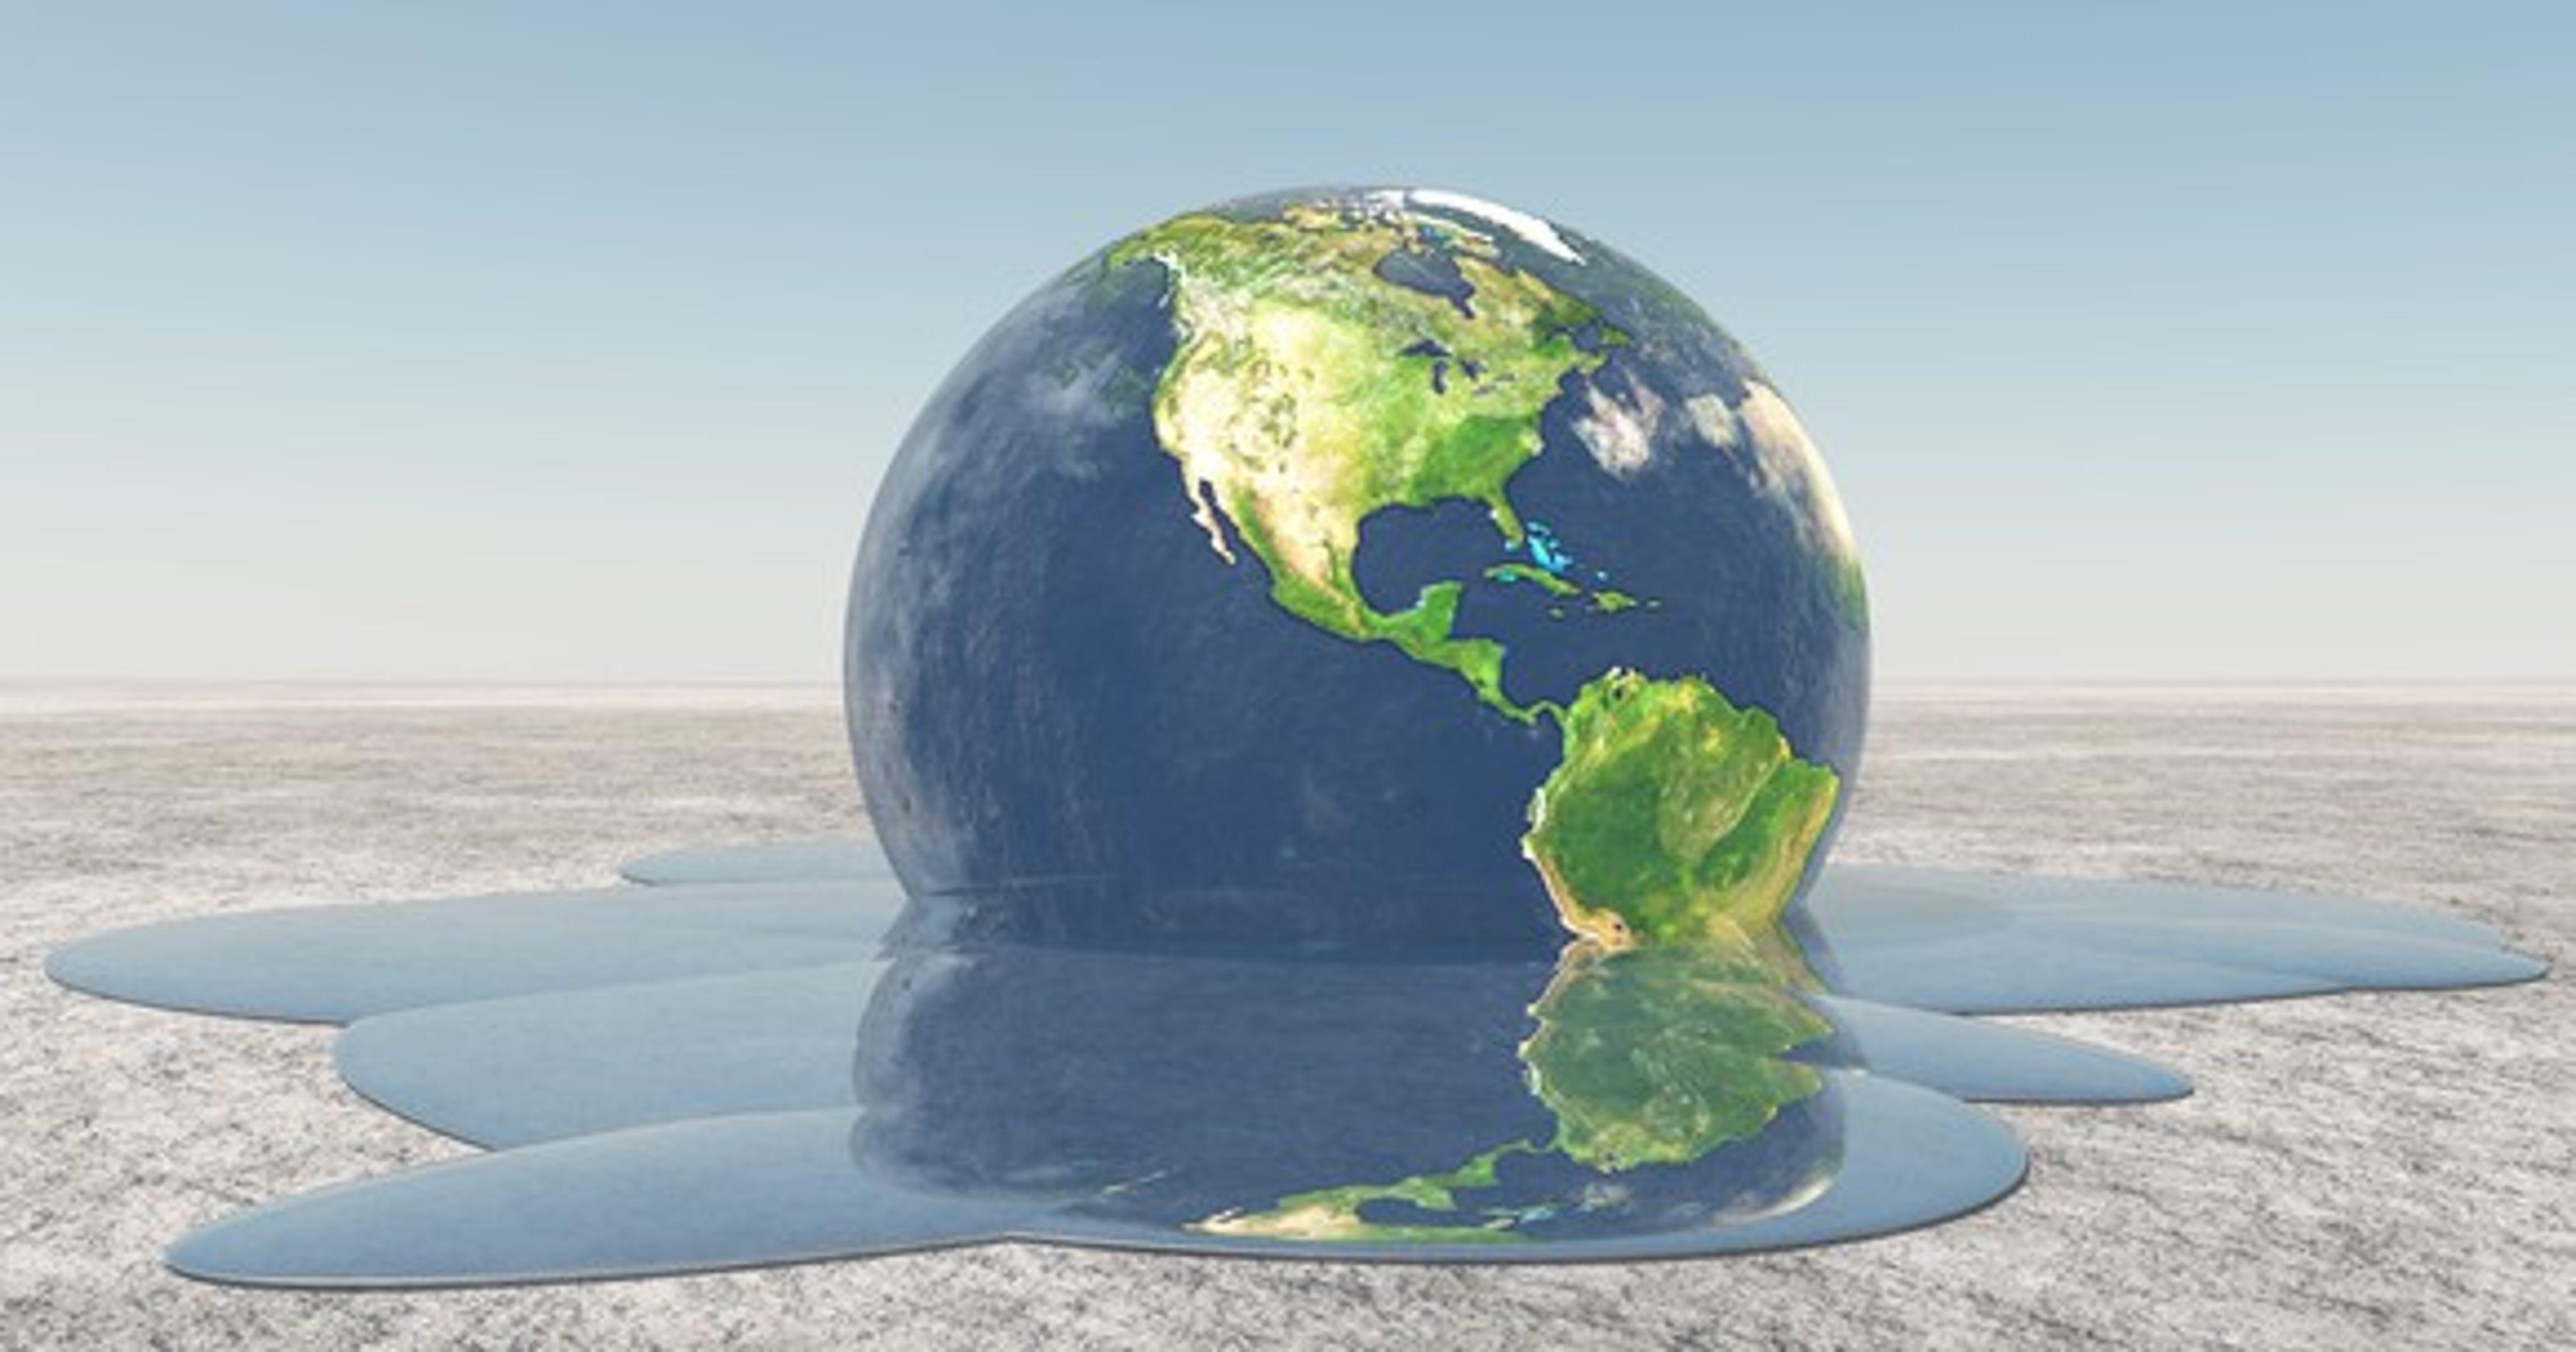 Hothouse Earth: Runaway global warming threatens